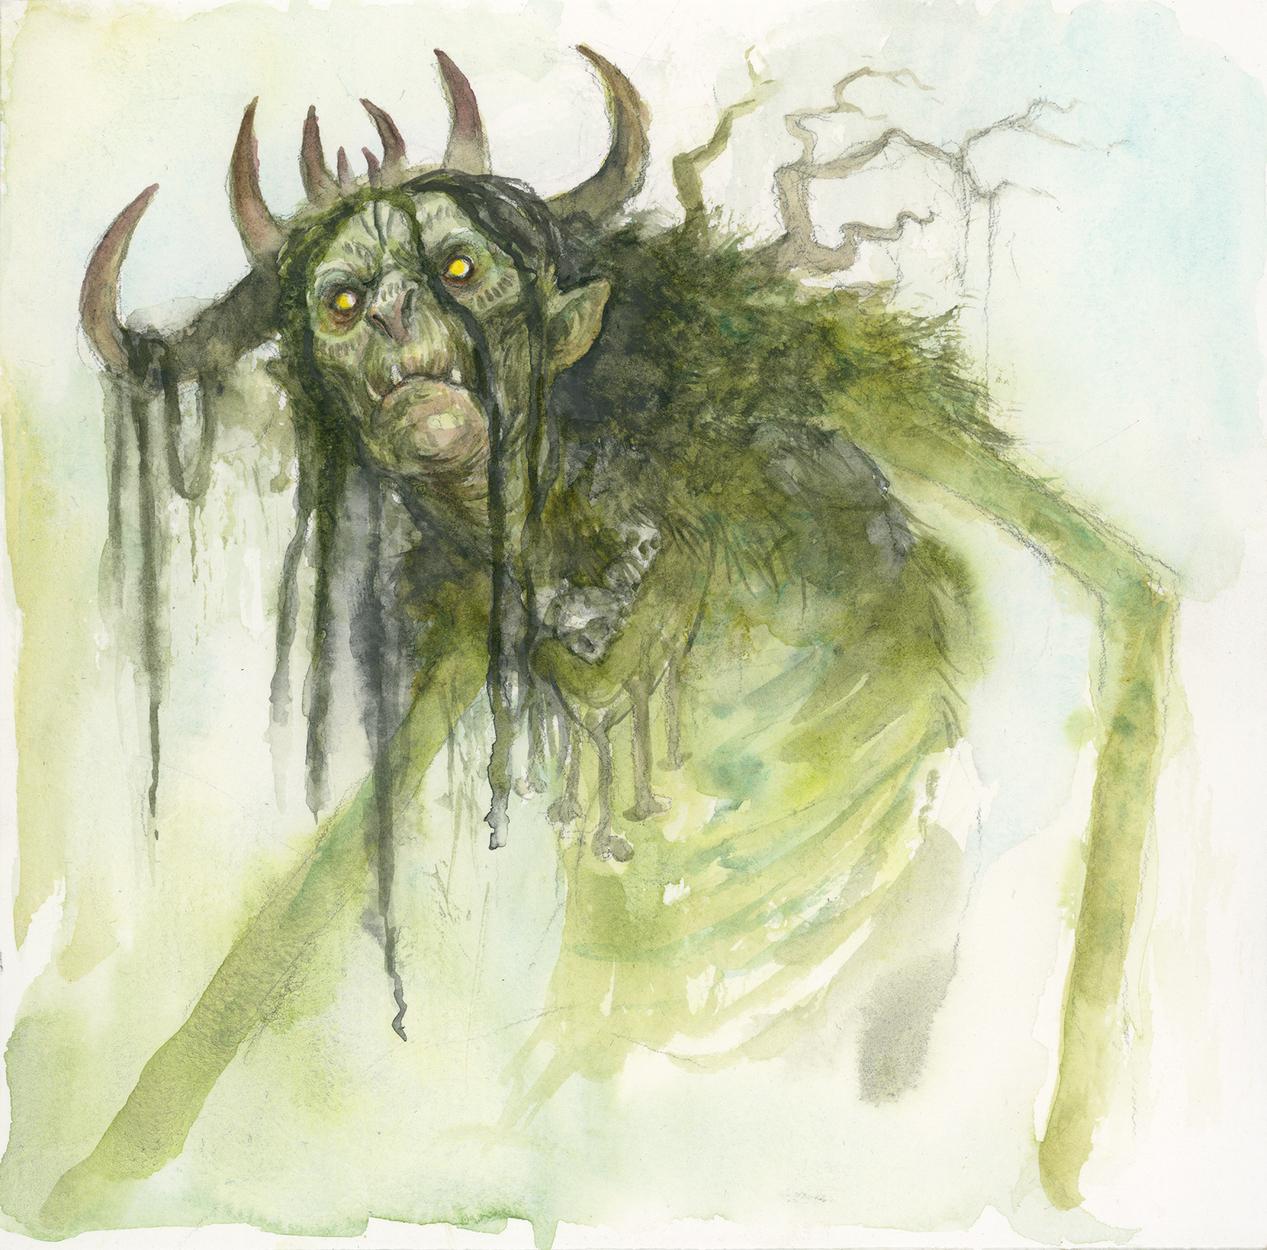 Swamp Witch Artwork by iris compiet